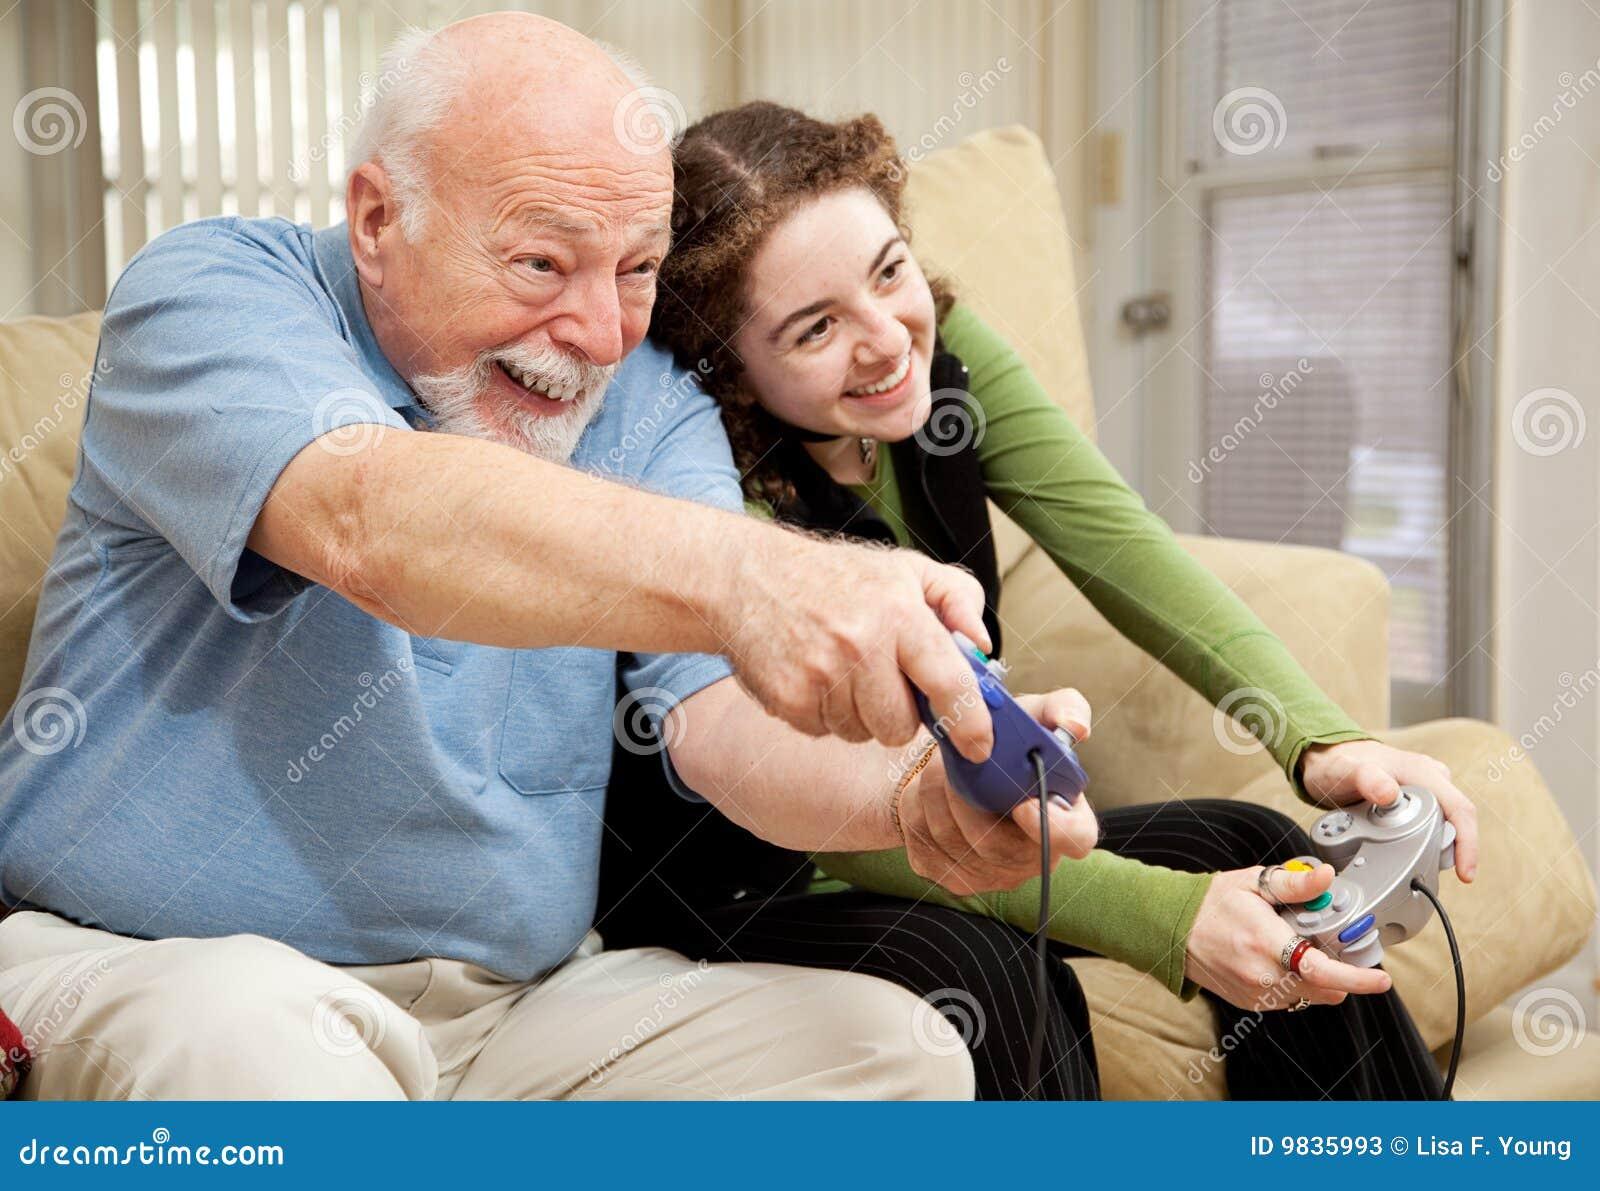 grandpas having sex with teenagers